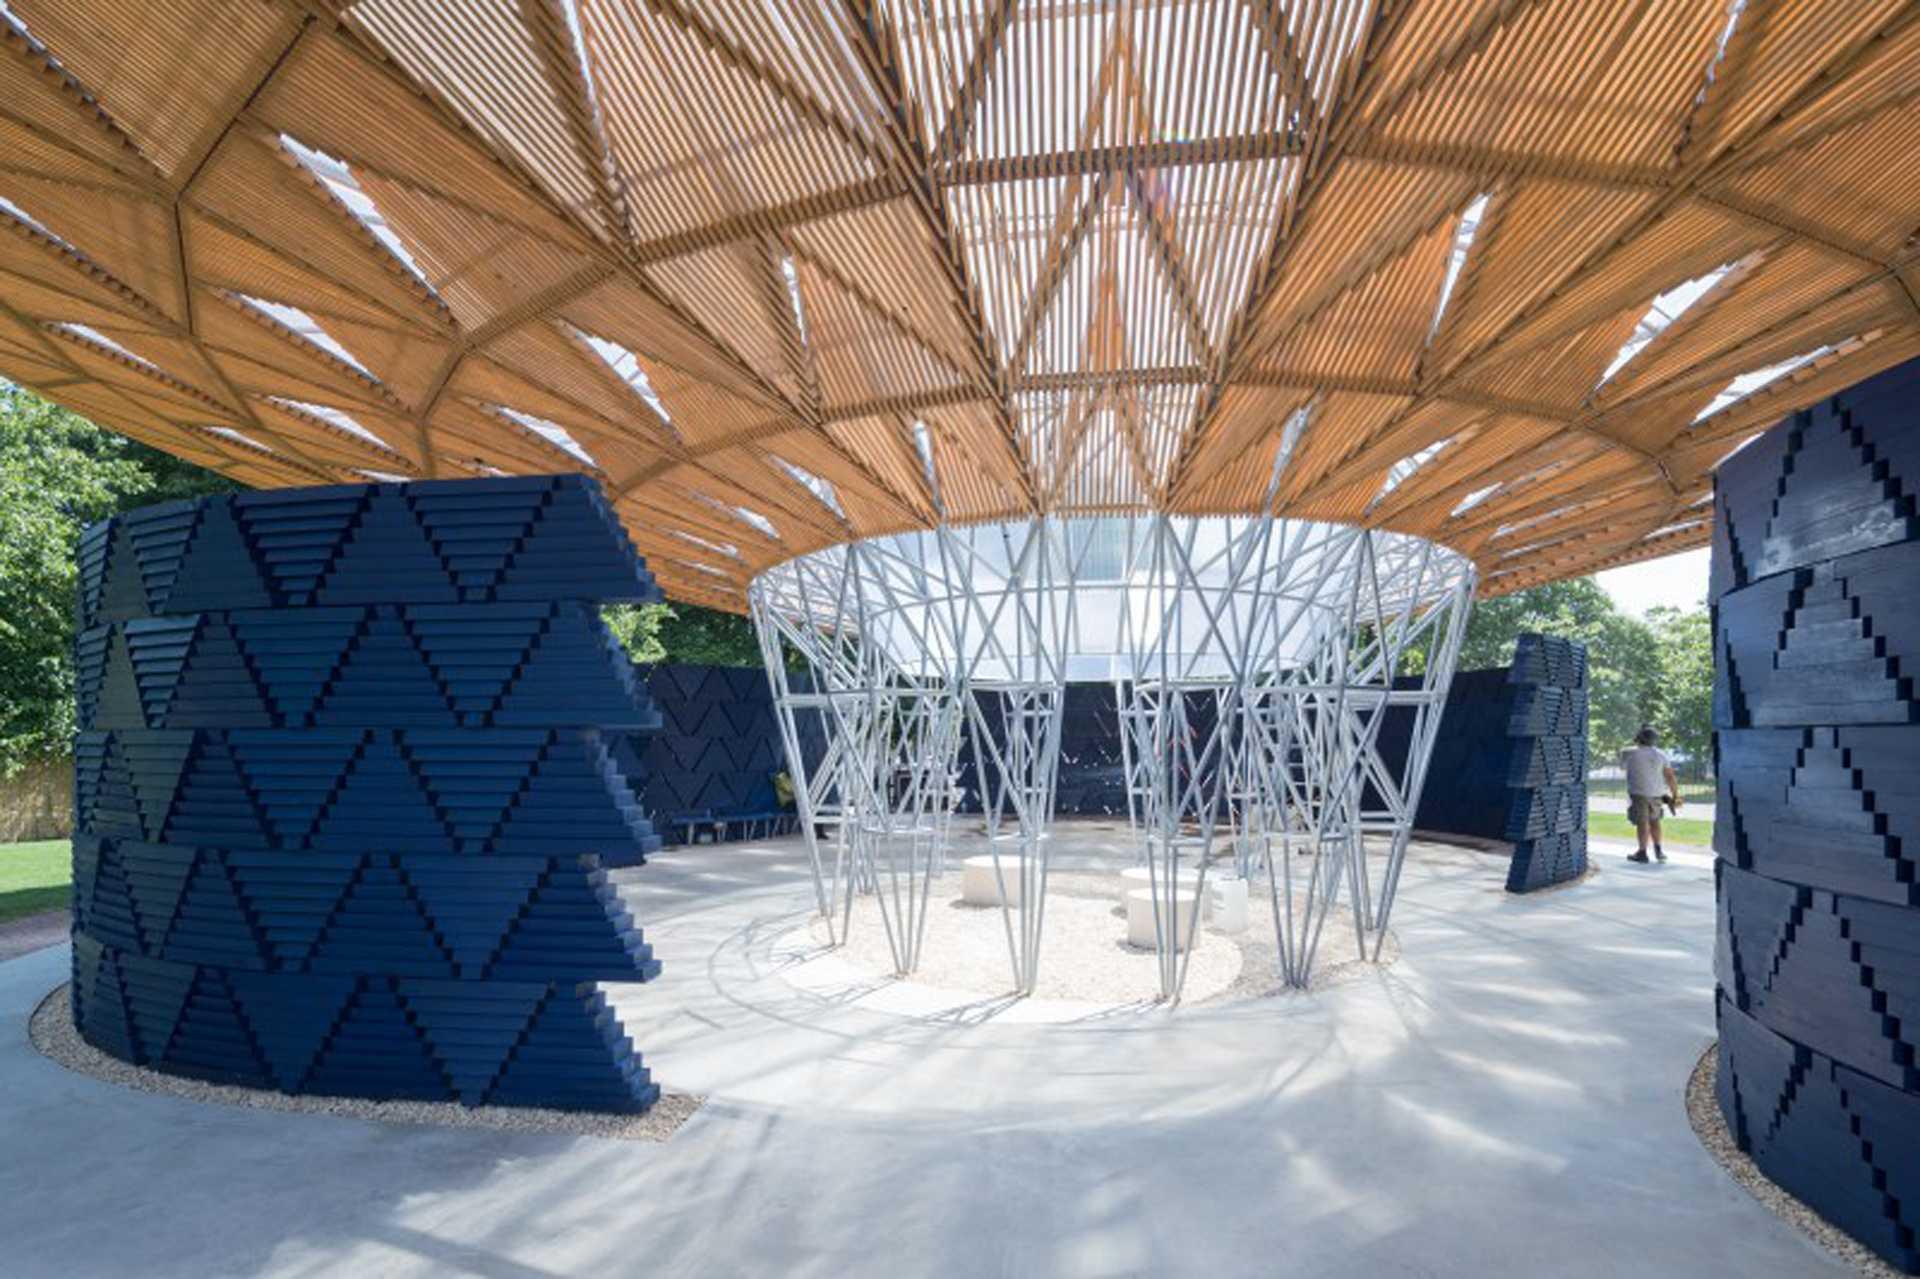 Serpentine Pavilion 2017  - 44 02 32